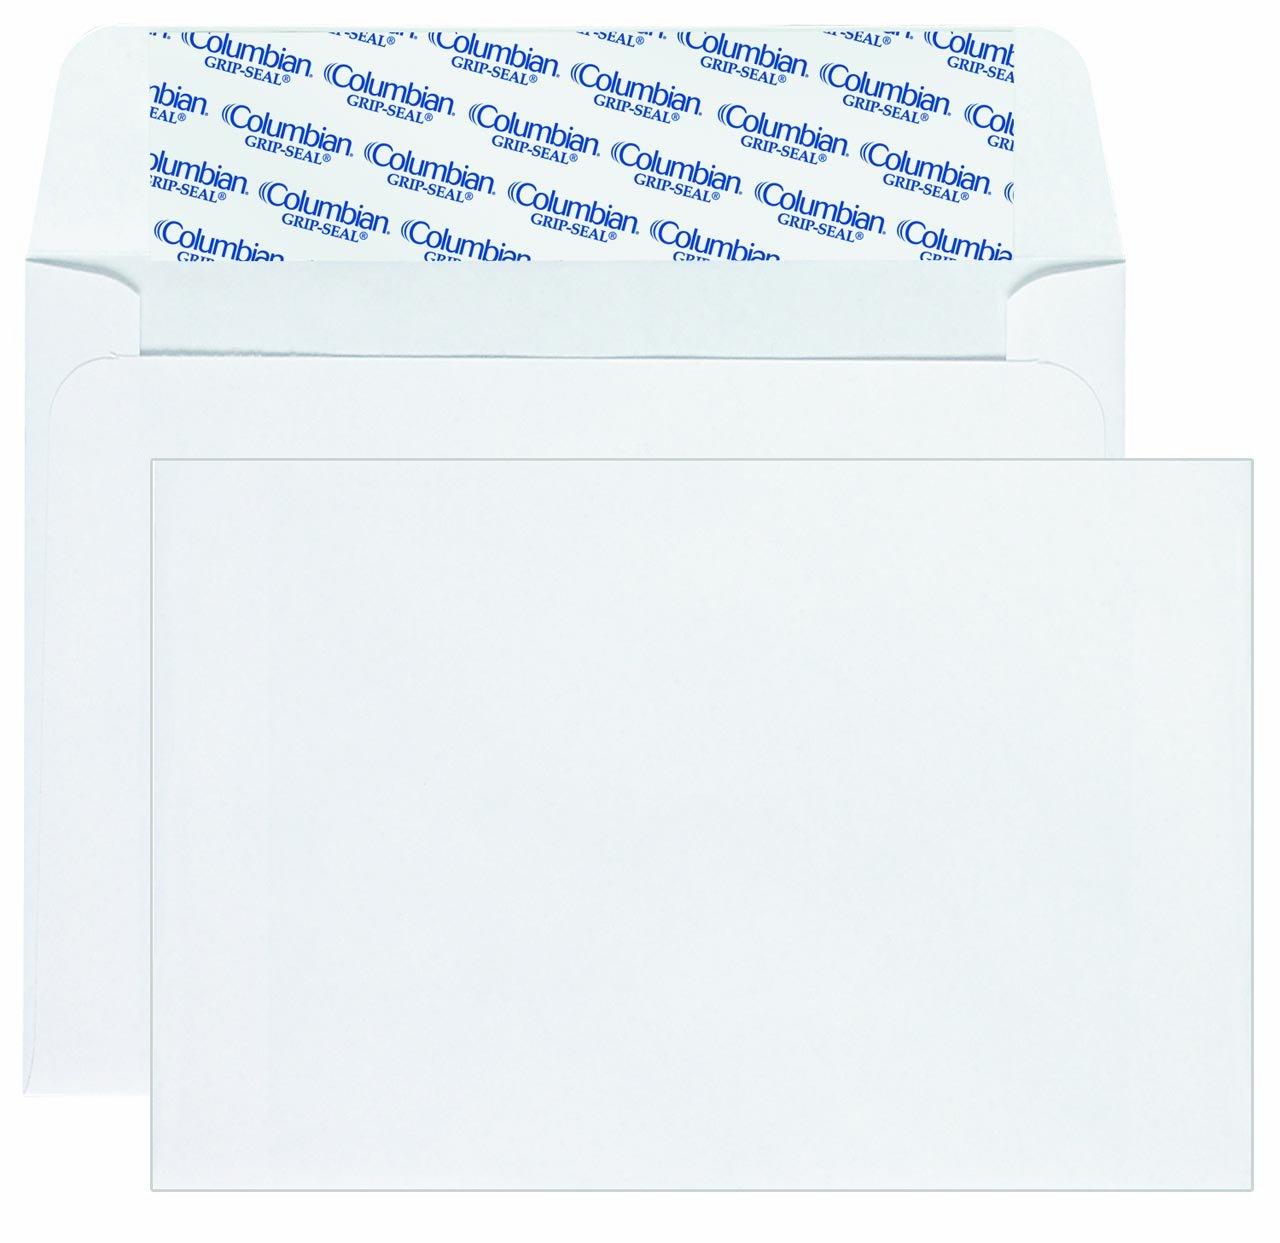 Columbian Invitation Envelopes, A9, Grip-Seal, 5.75 x 8.75 Inch, White, 100 Per Box (CO468) MEAD WESTVACO